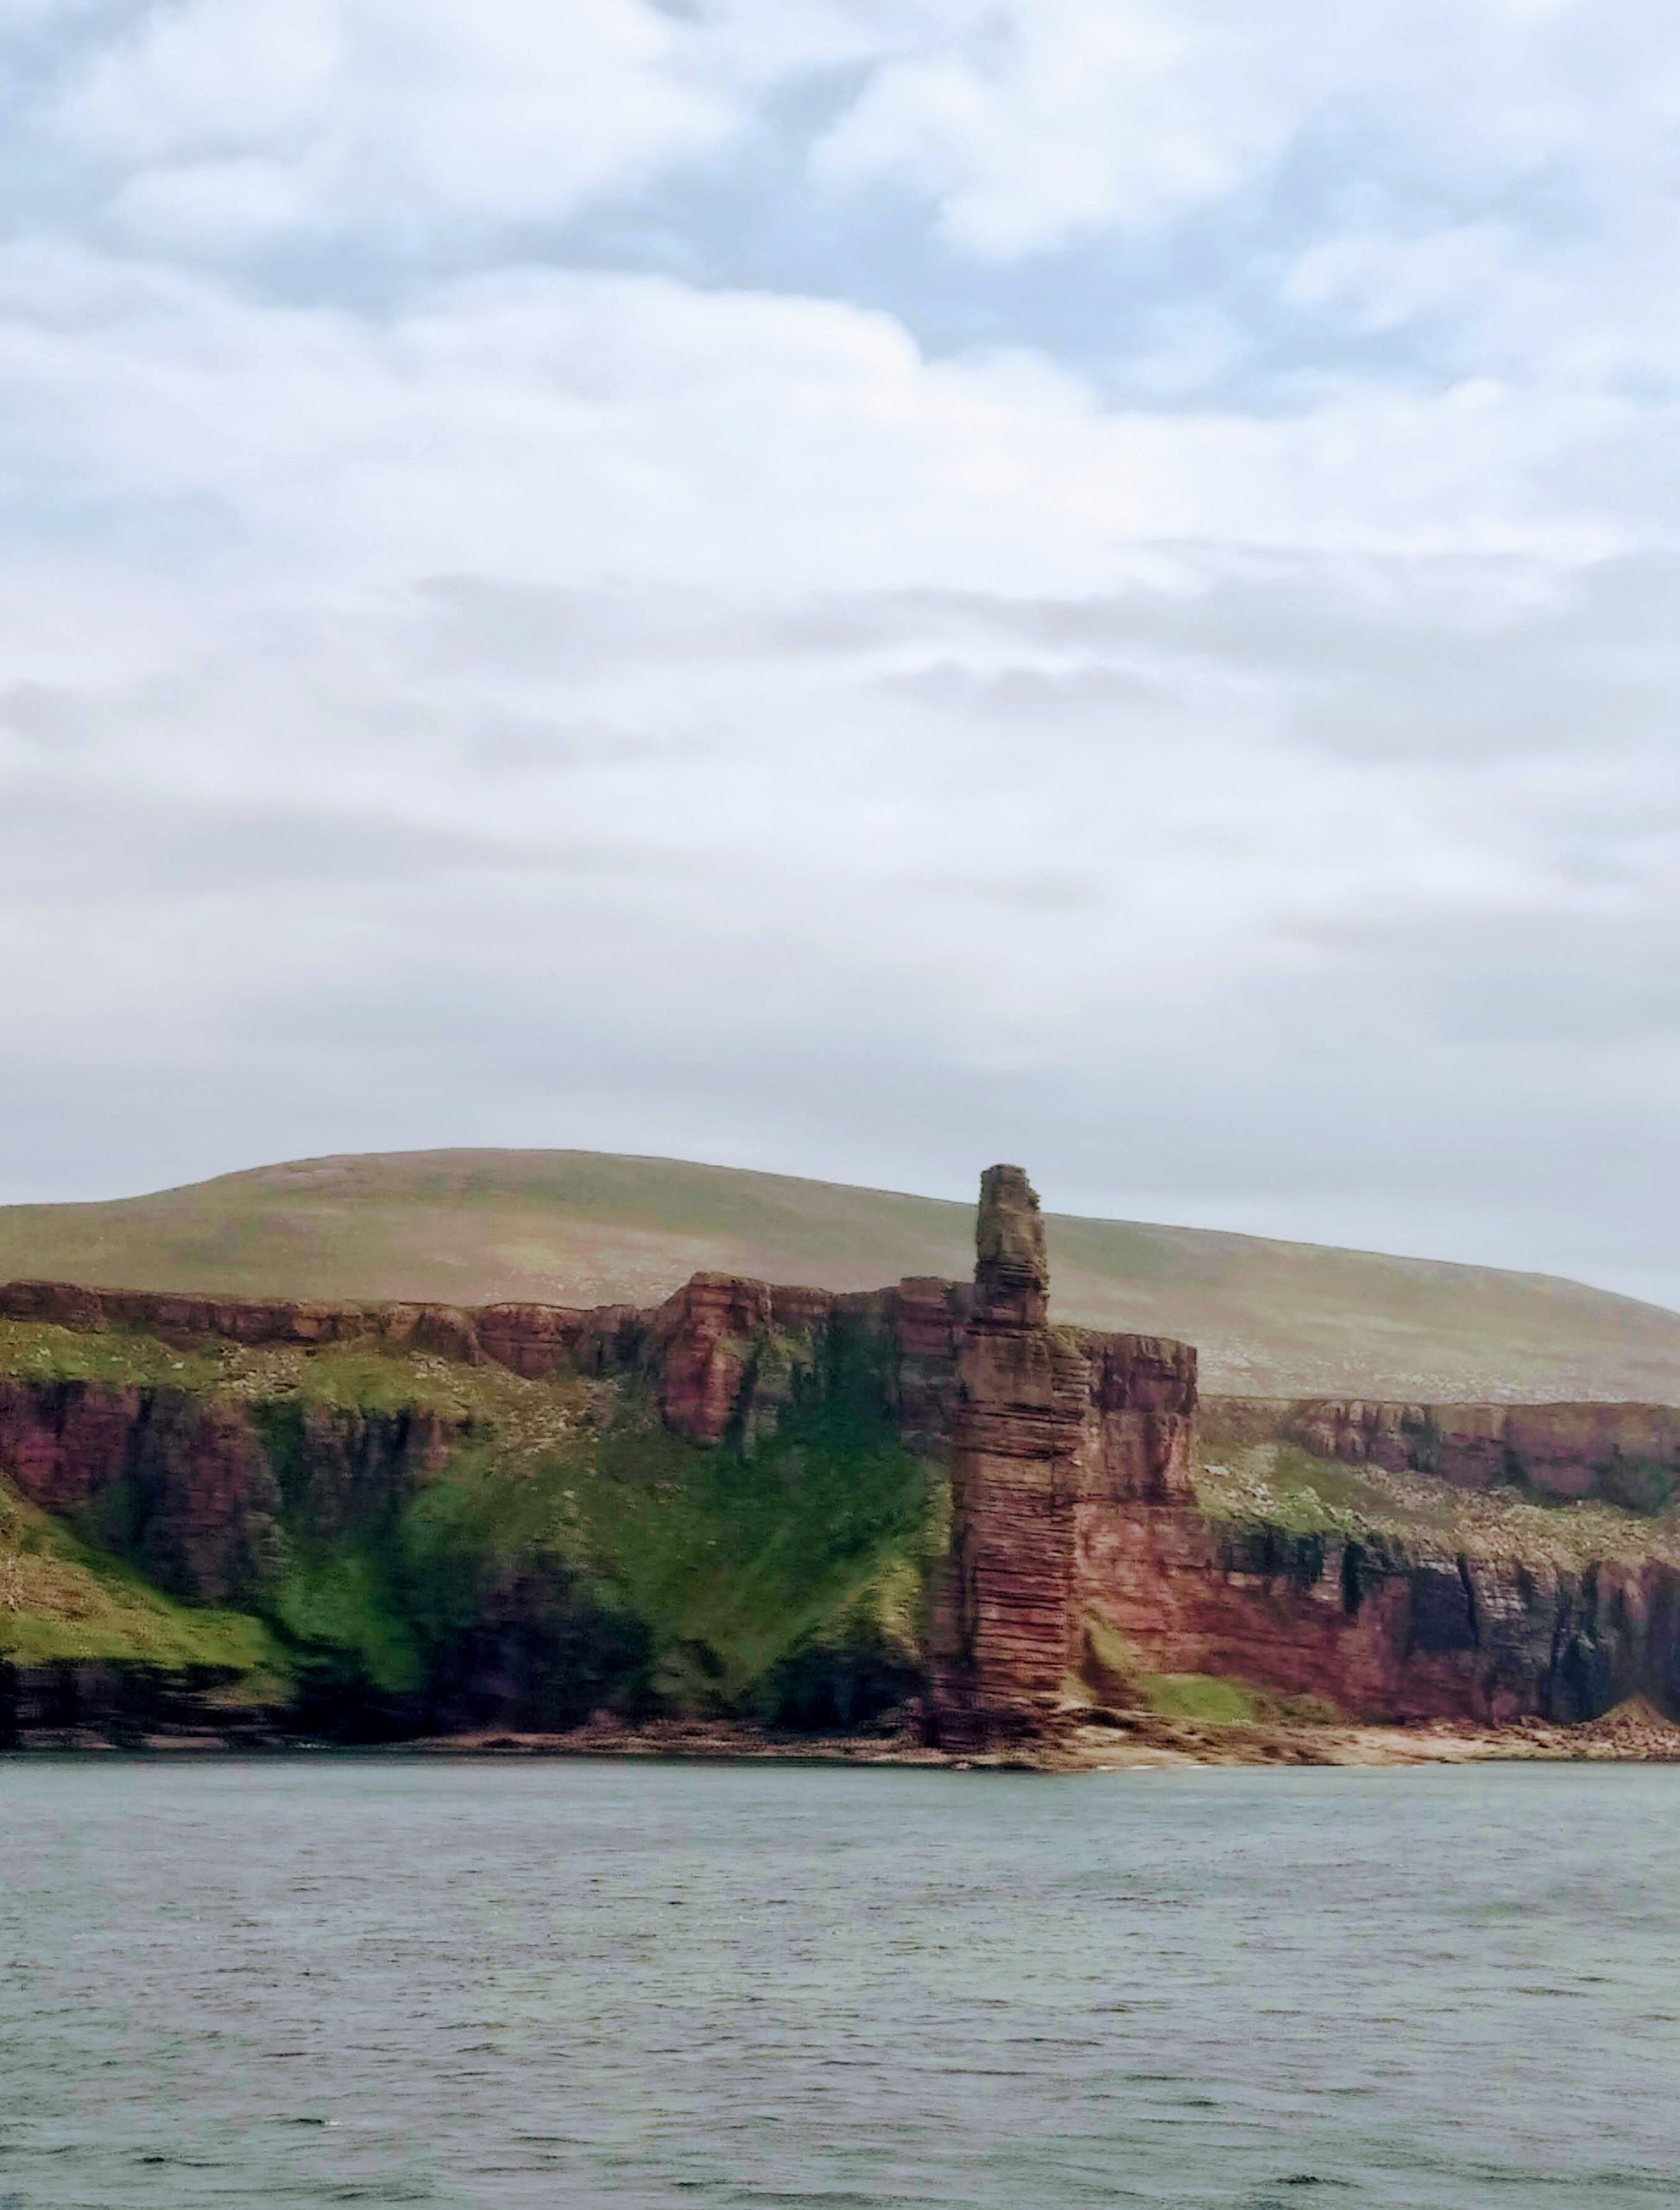 Old Man of Hoy - Orkney